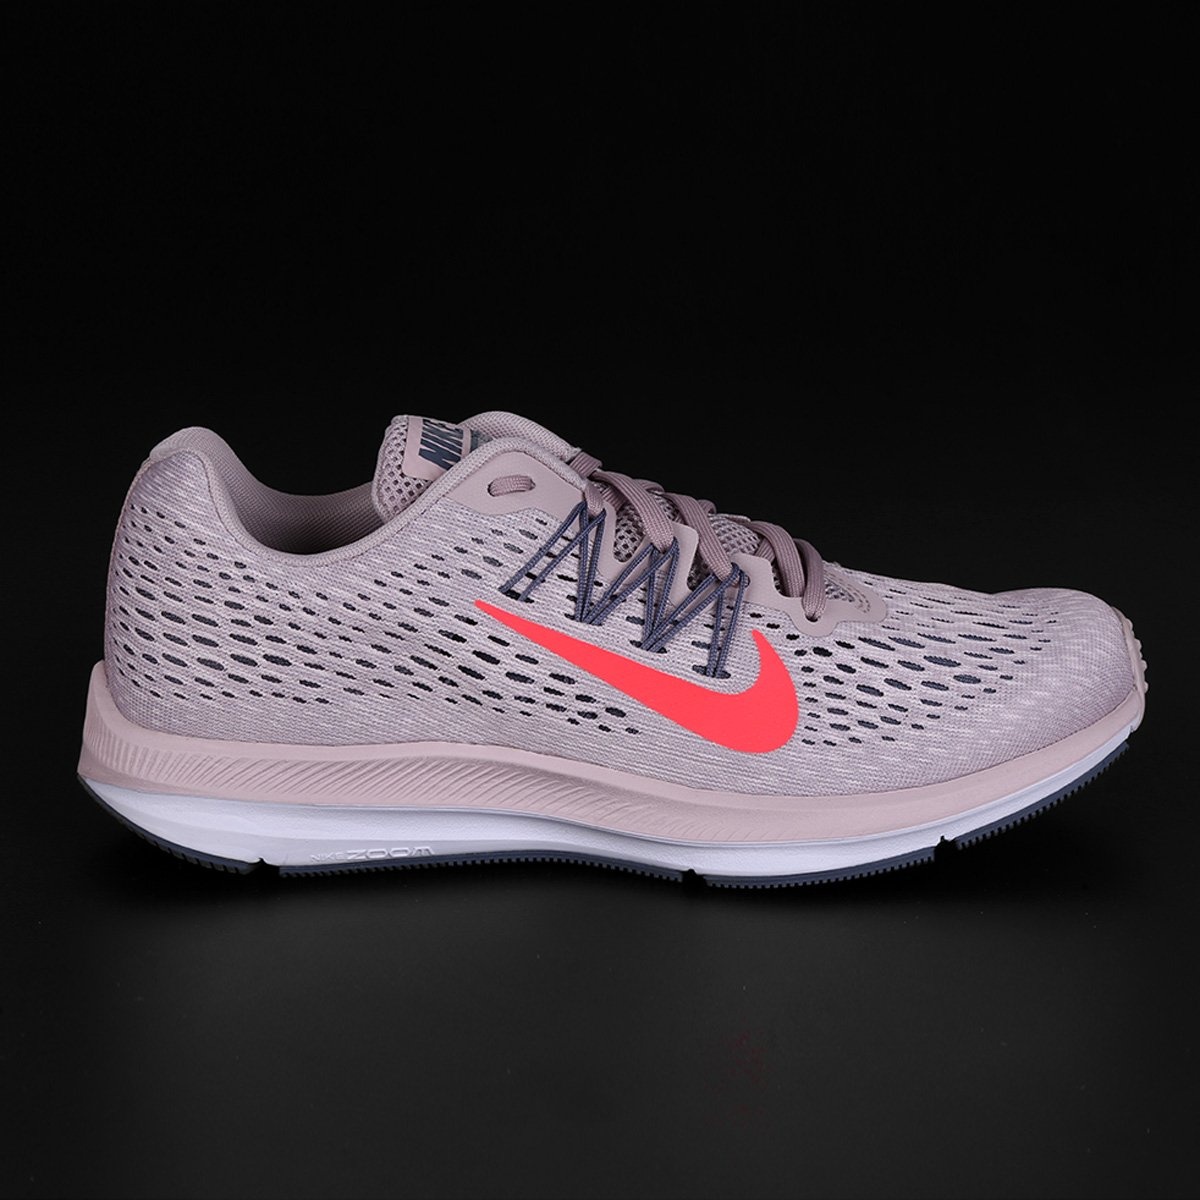 Tênis Feminino Nike Winflo Rosa Zoom WMNS Nike WMNS 5 Tênis 1fqwP1